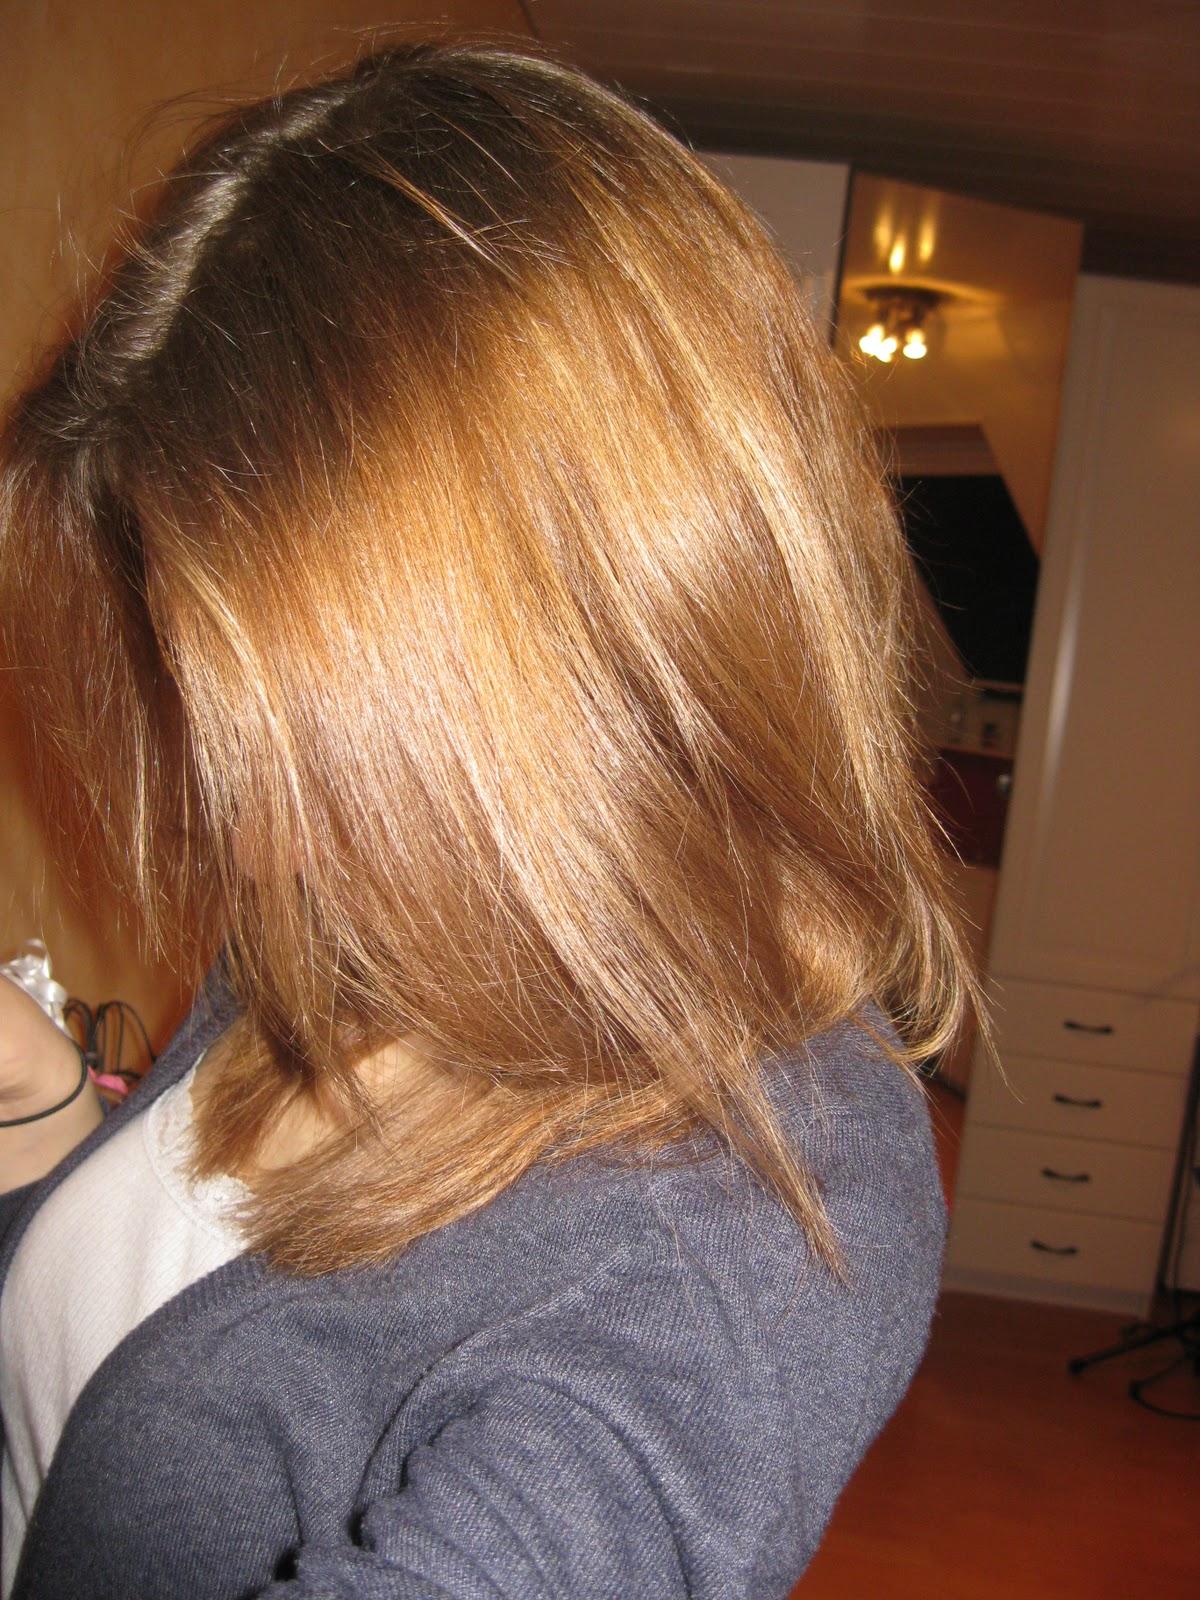 Die Heilgräser für die Kopfhaare beim Haarausfall